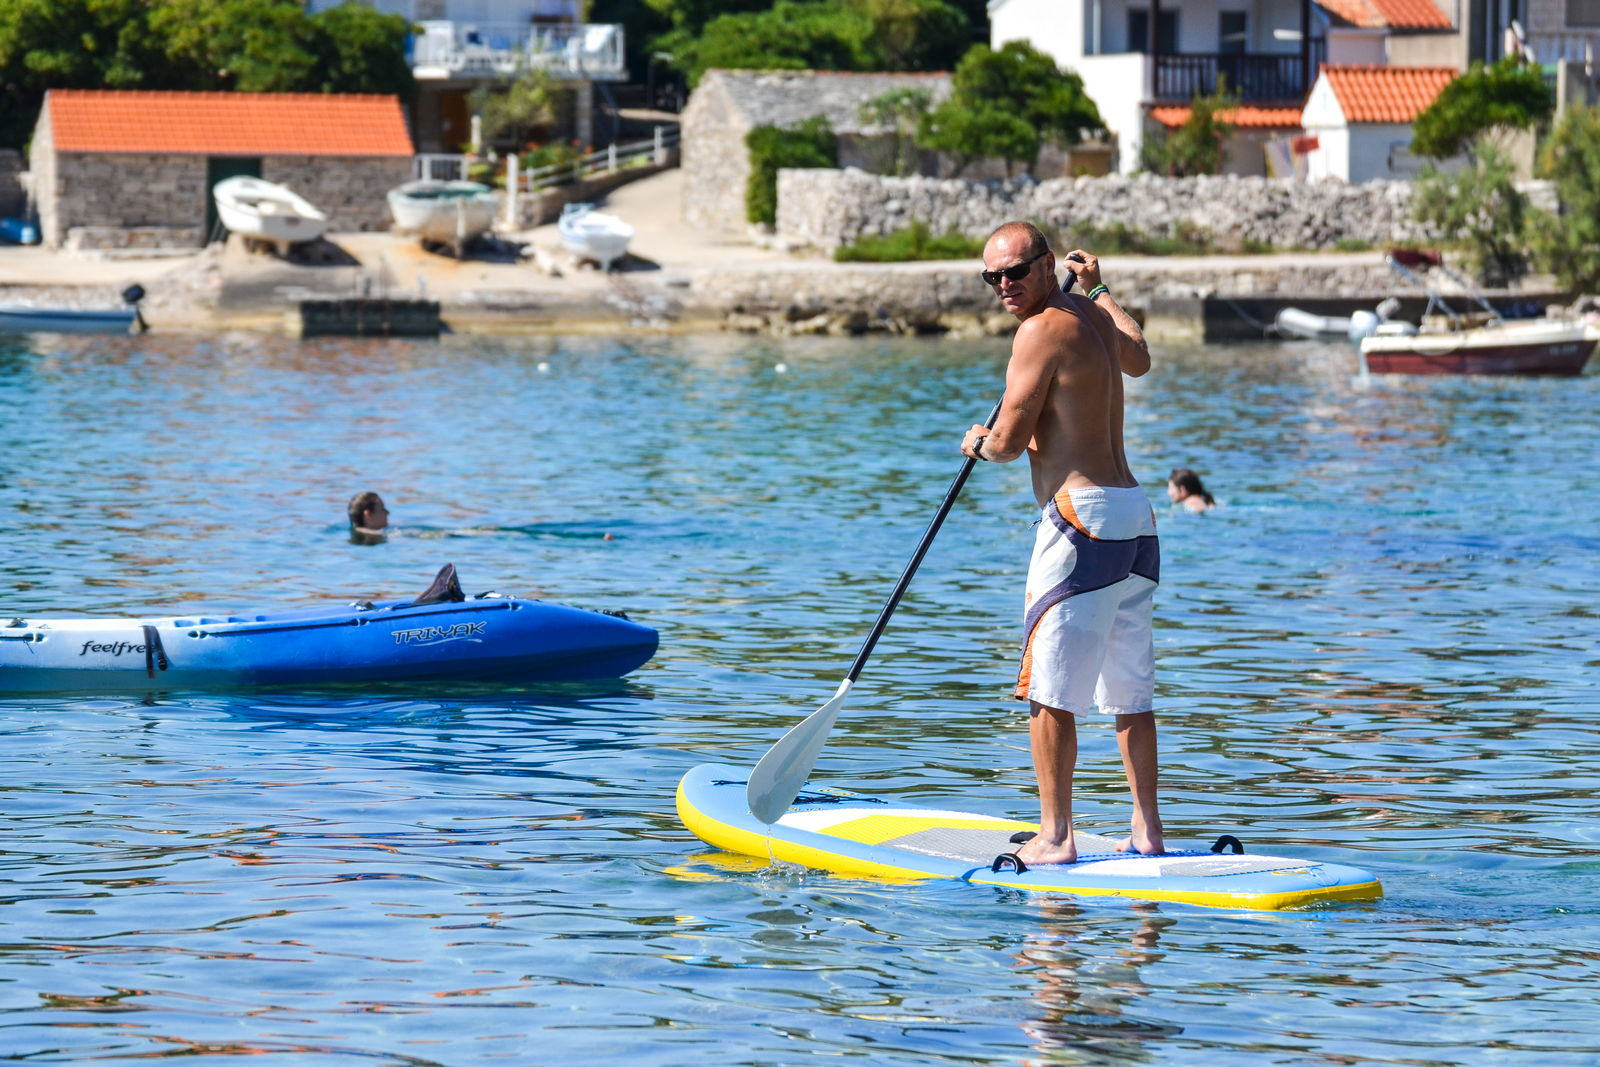 korcula windsurfing lessons extreme 10 - Location - Prizba, Korcula